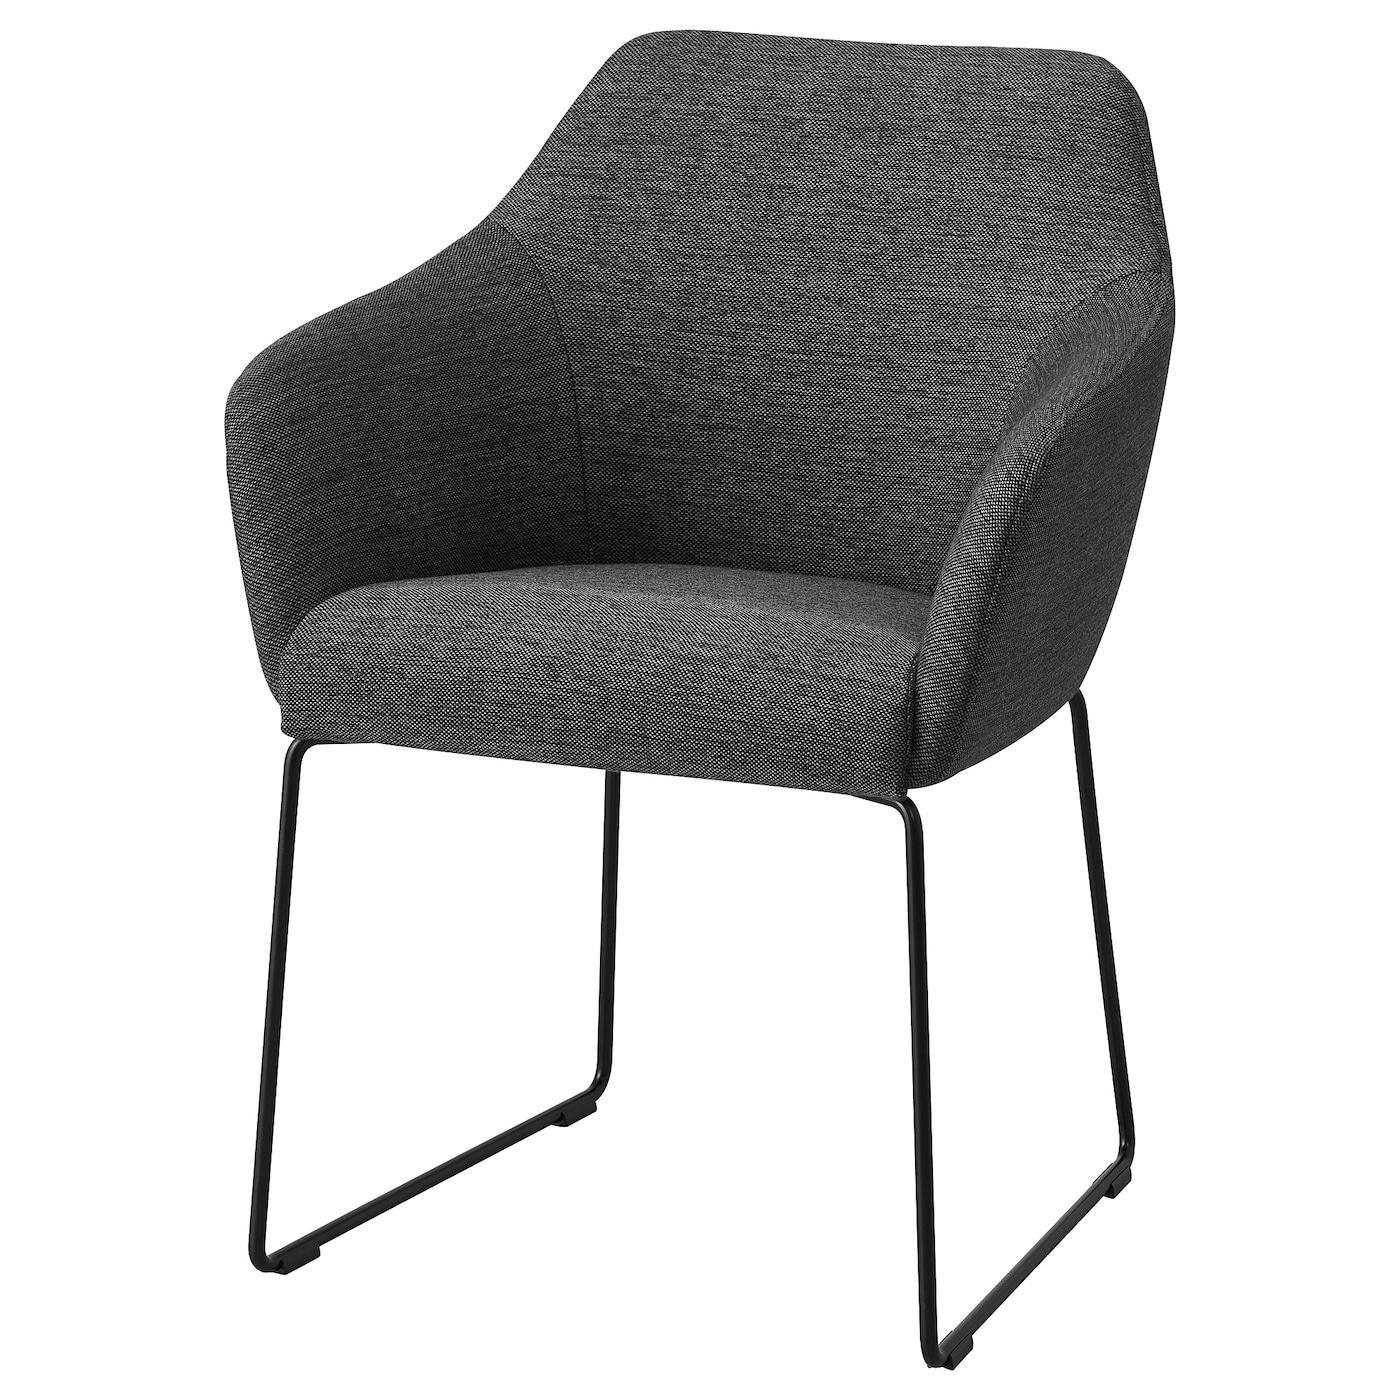 TOSSBERG Silla metal negro, gris